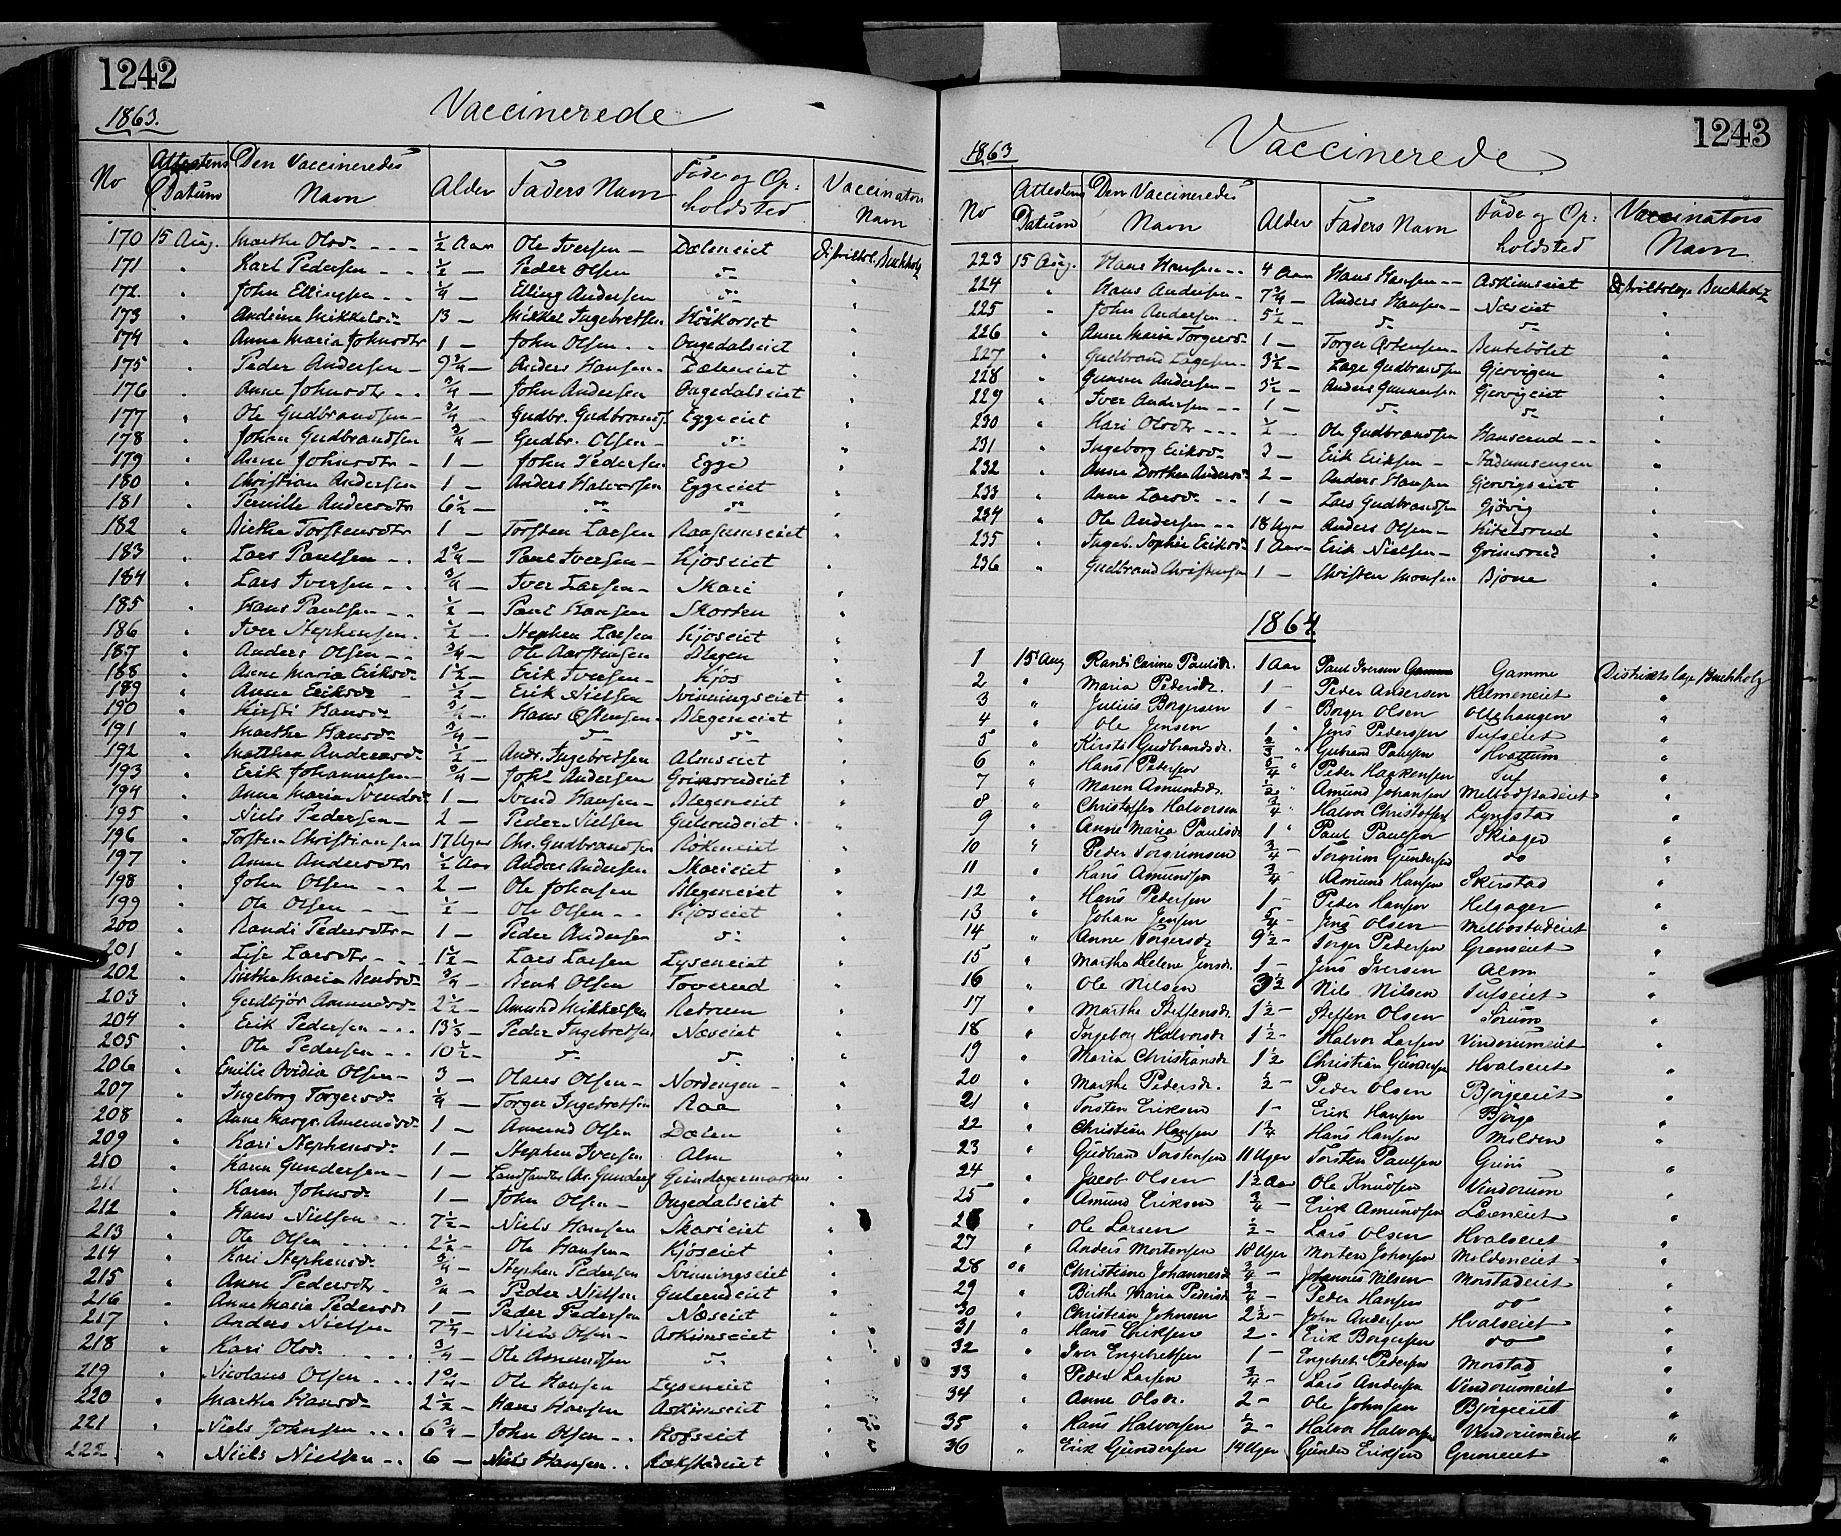 SAH, Gran prestekontor, Ministerialbok nr. 12, 1856-1874, s. 1242-1243